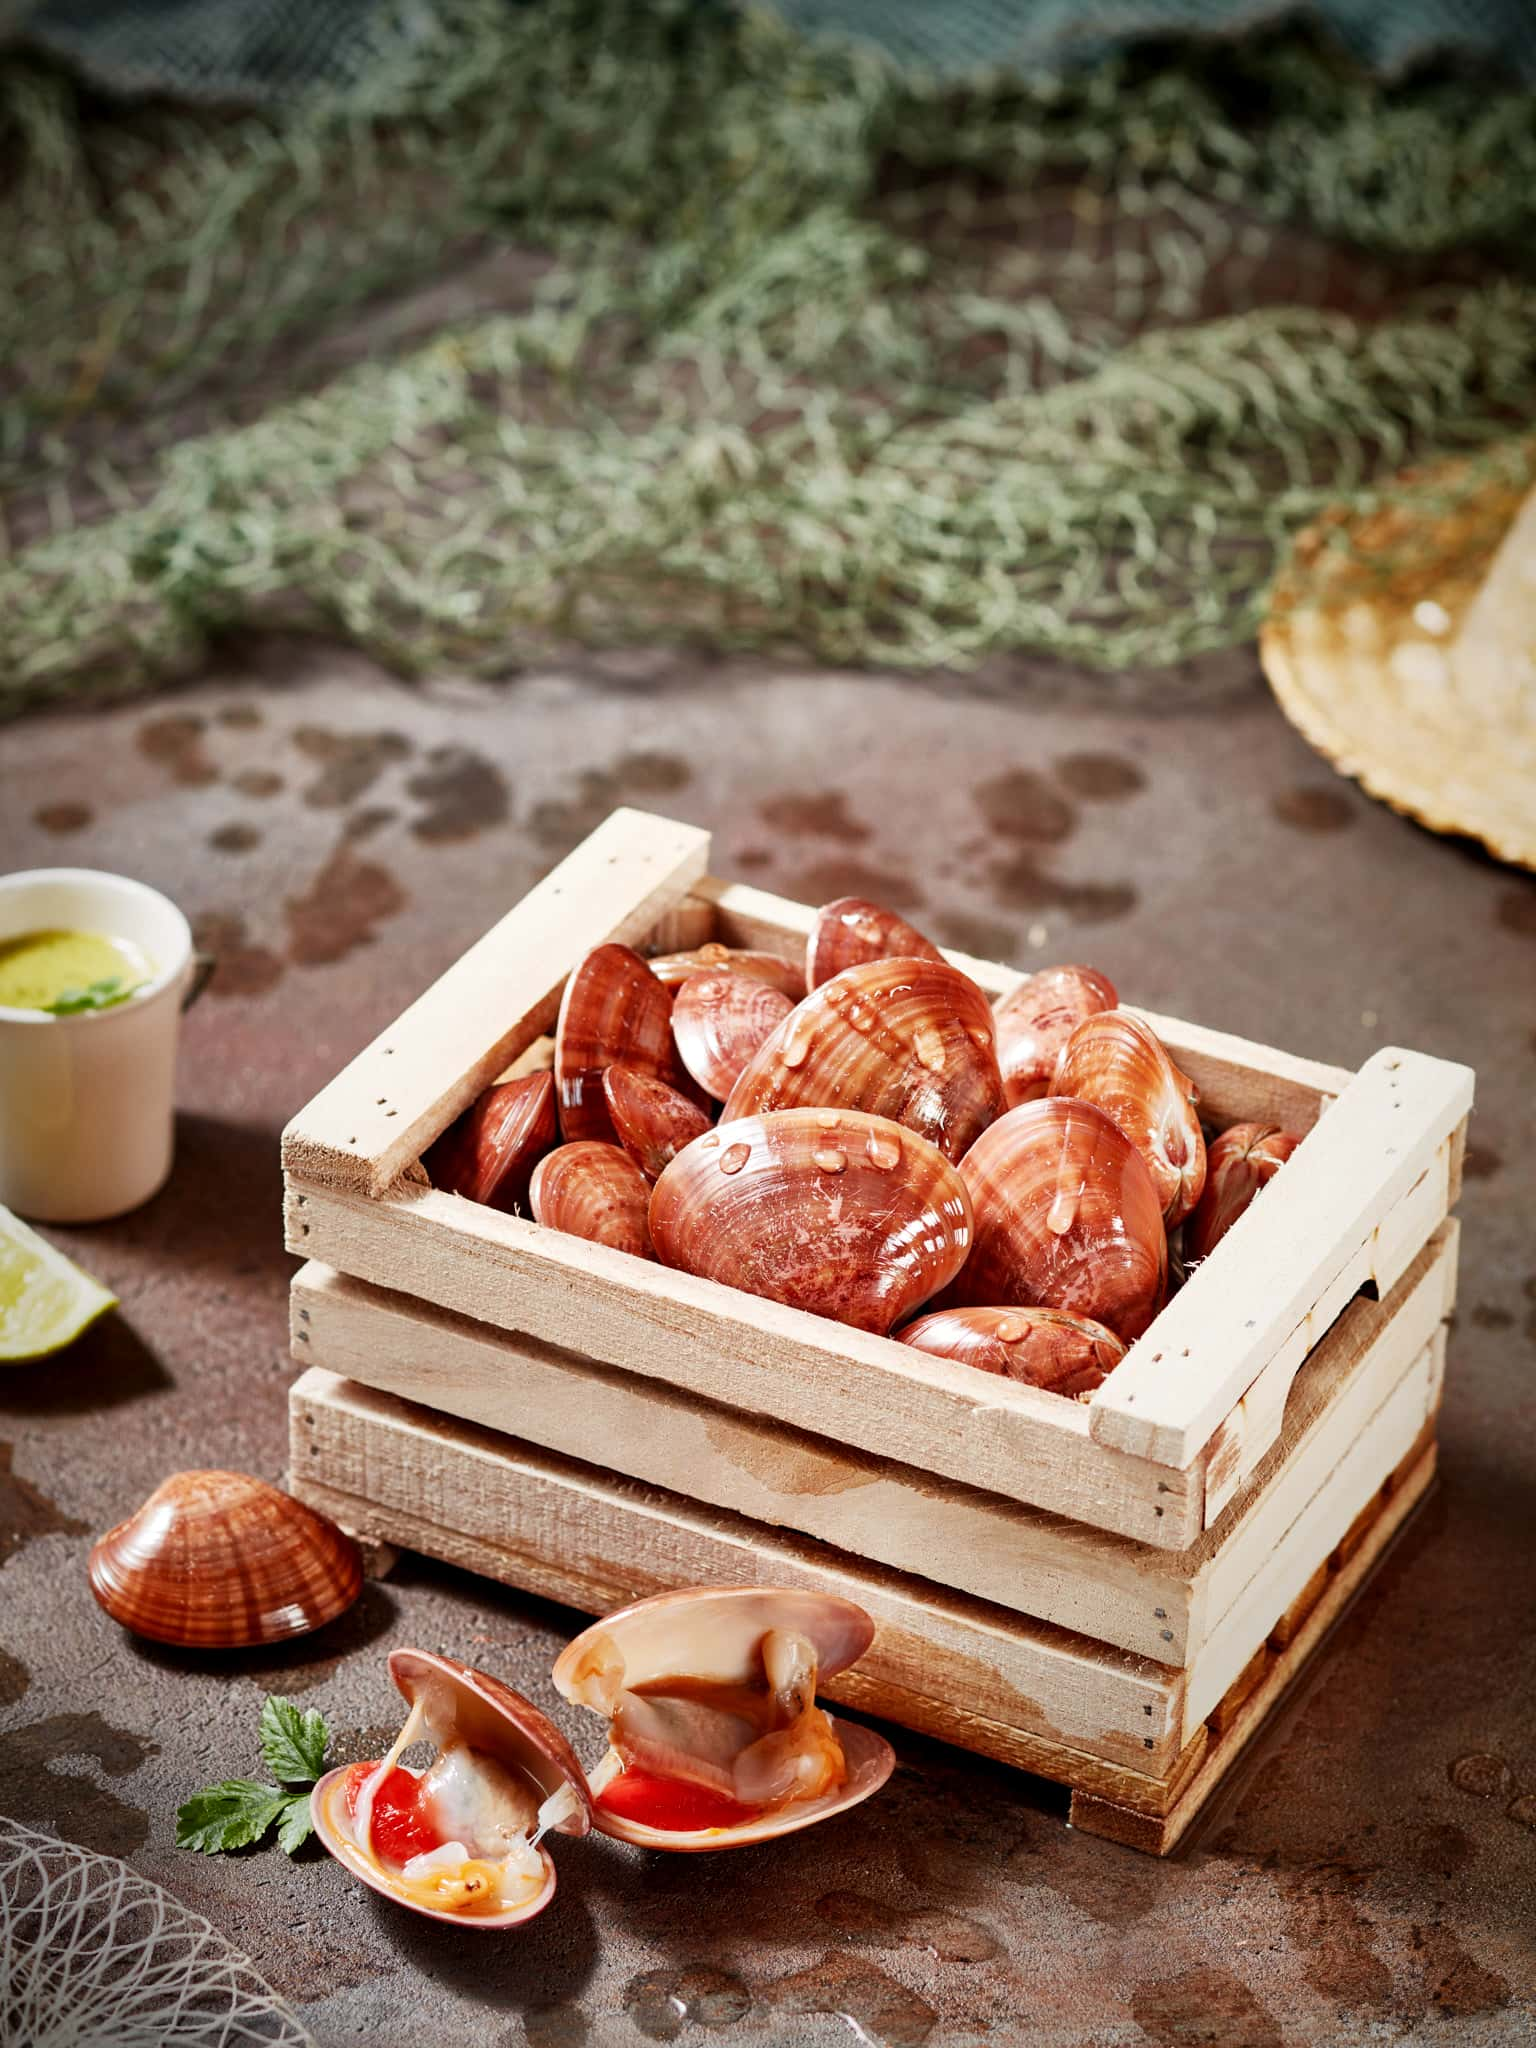 fotografo food commerciale advertising molluschi pescati pescheria storytelling trieste genova venezia bologna